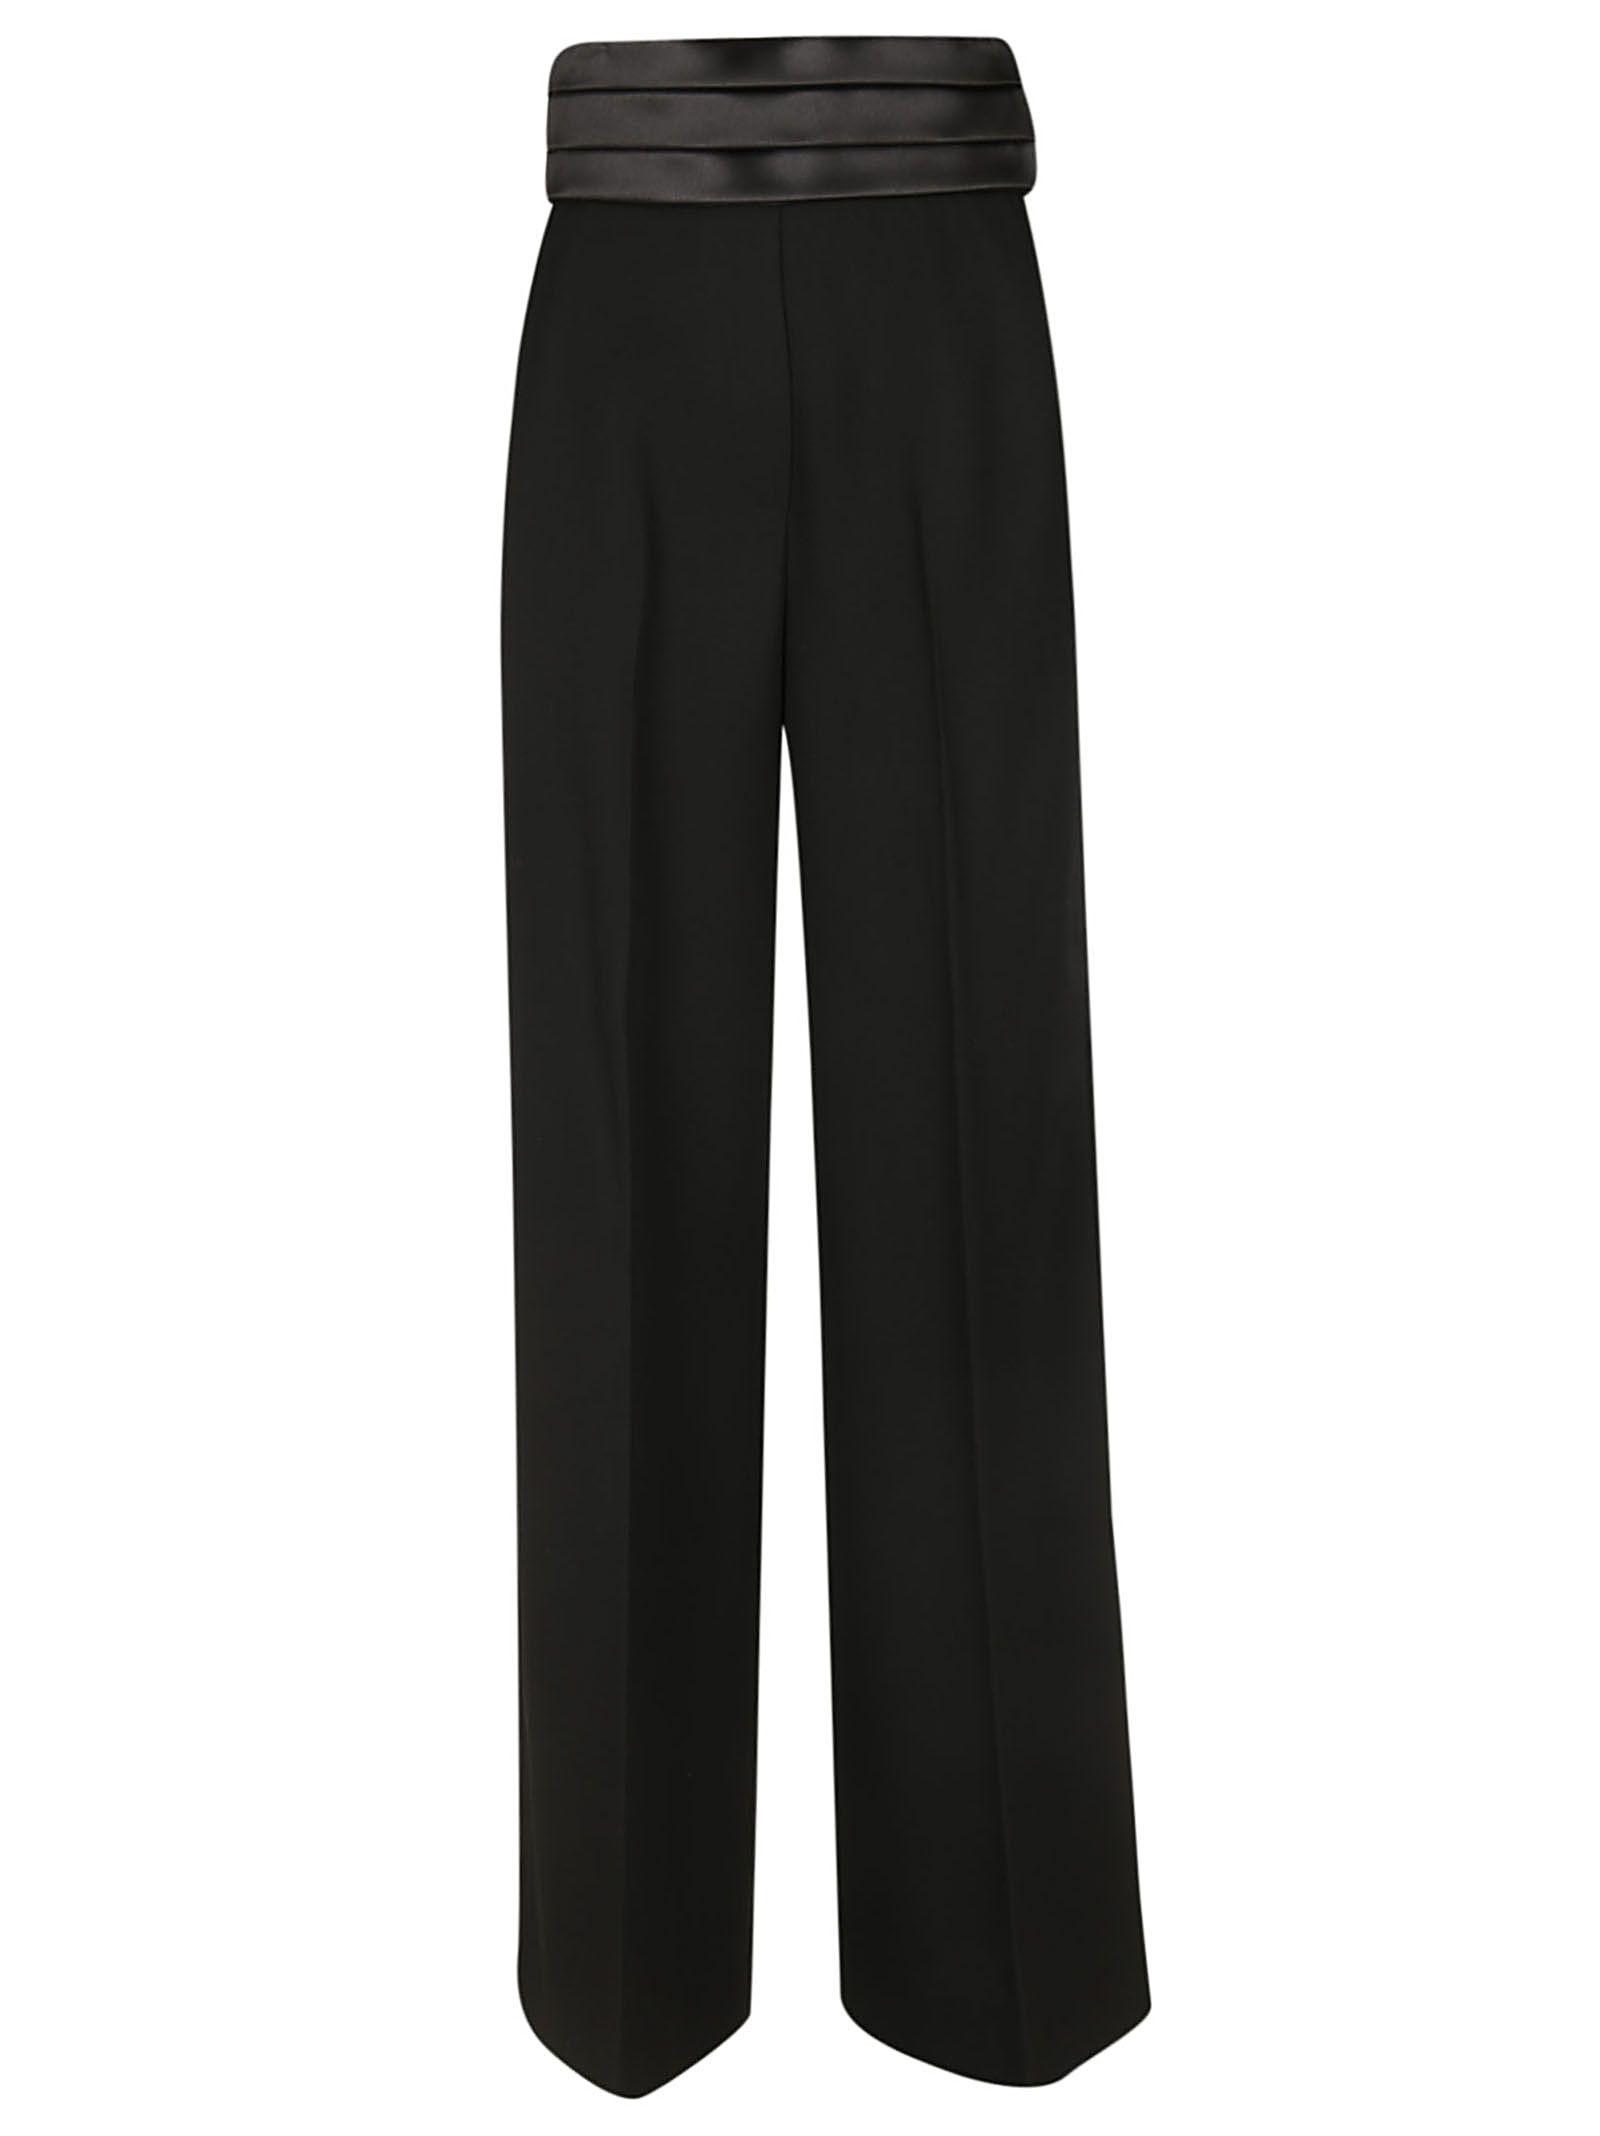 Tara Jarmon High Waist Trousers